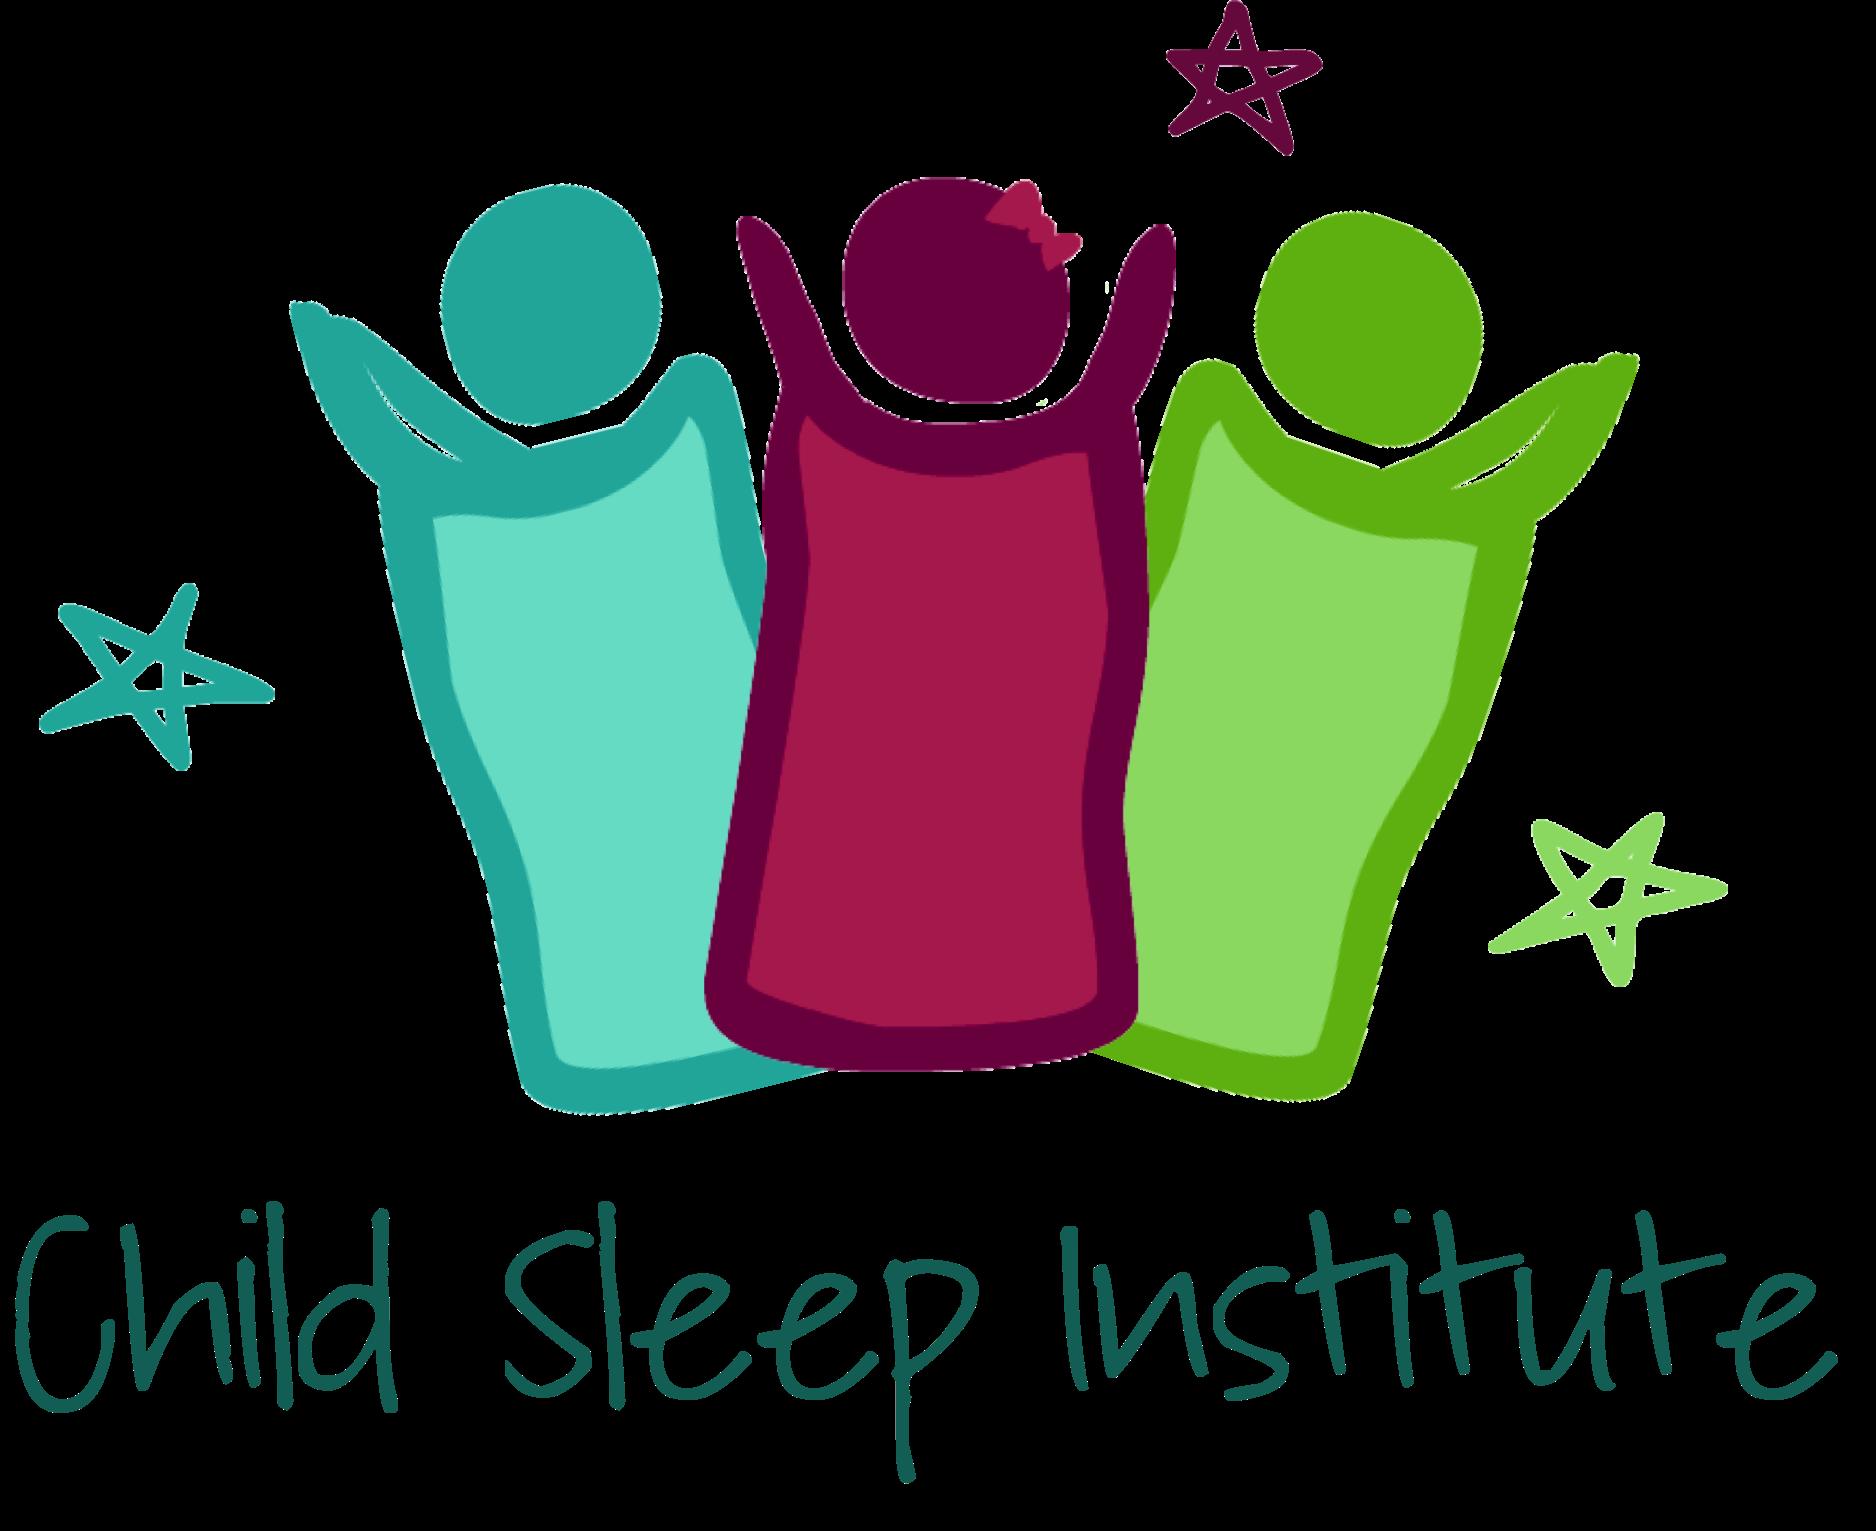 Curriculum clipart social emotional development. Child sleep institute resources